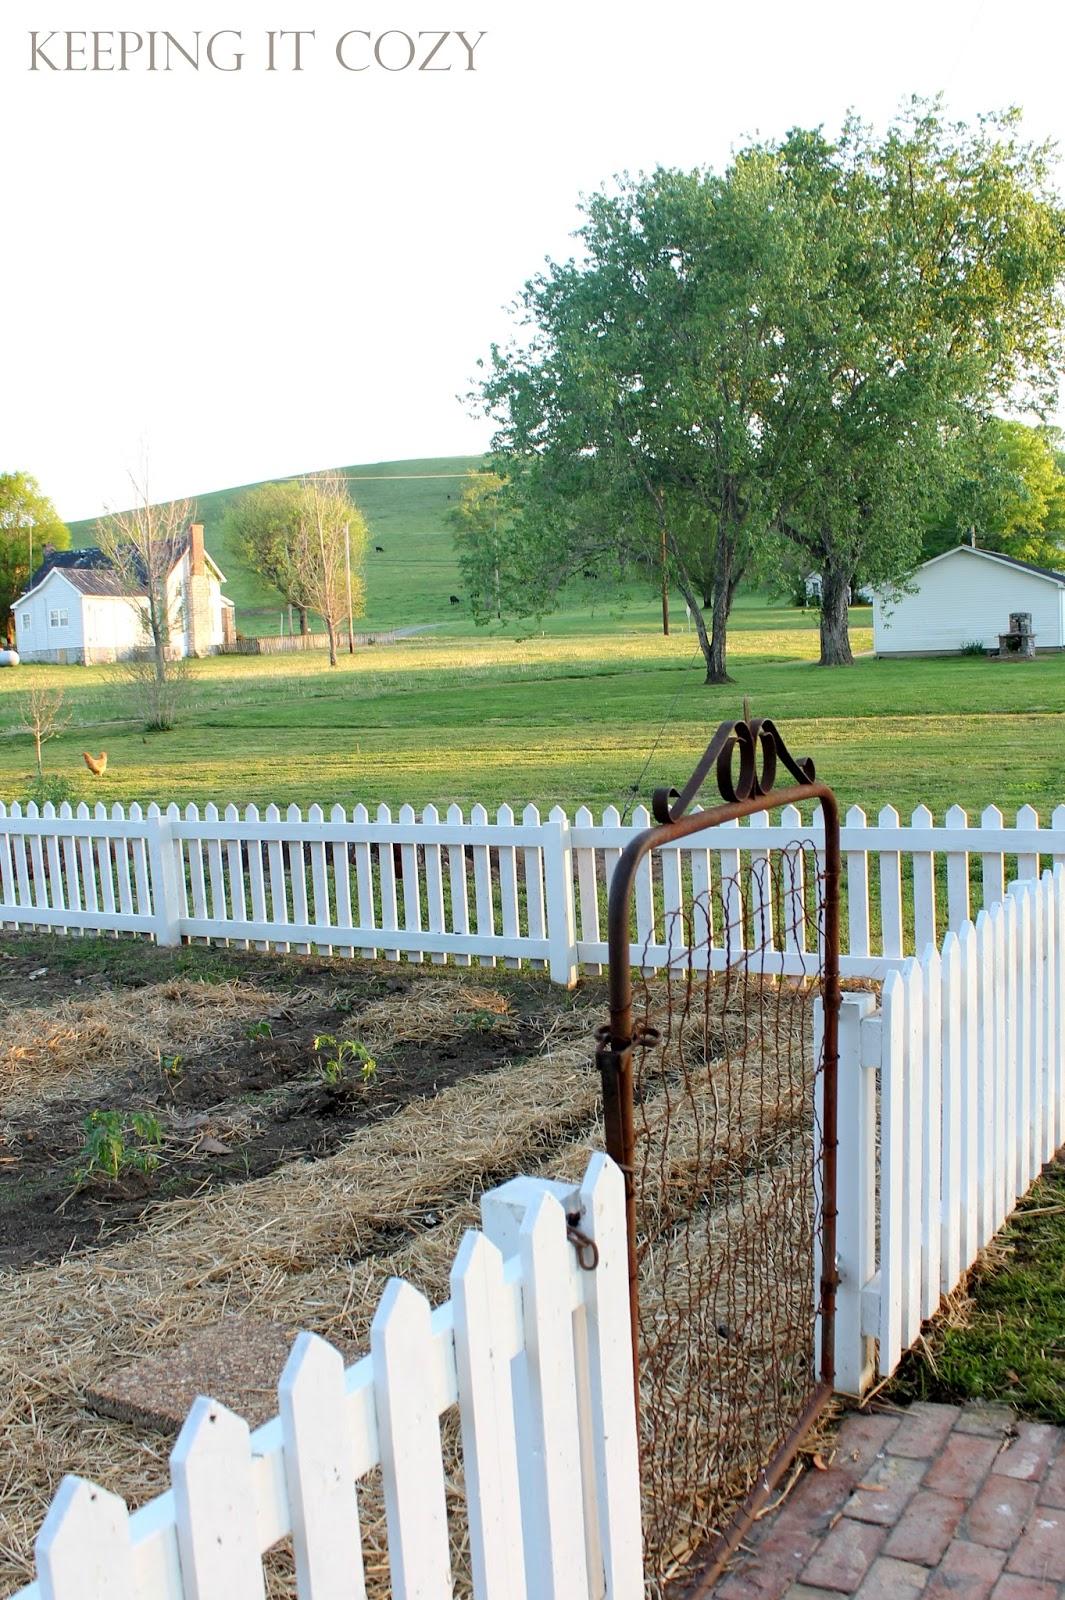 Kitchen Garden Fence Keeping It Cozy The Garden Fence